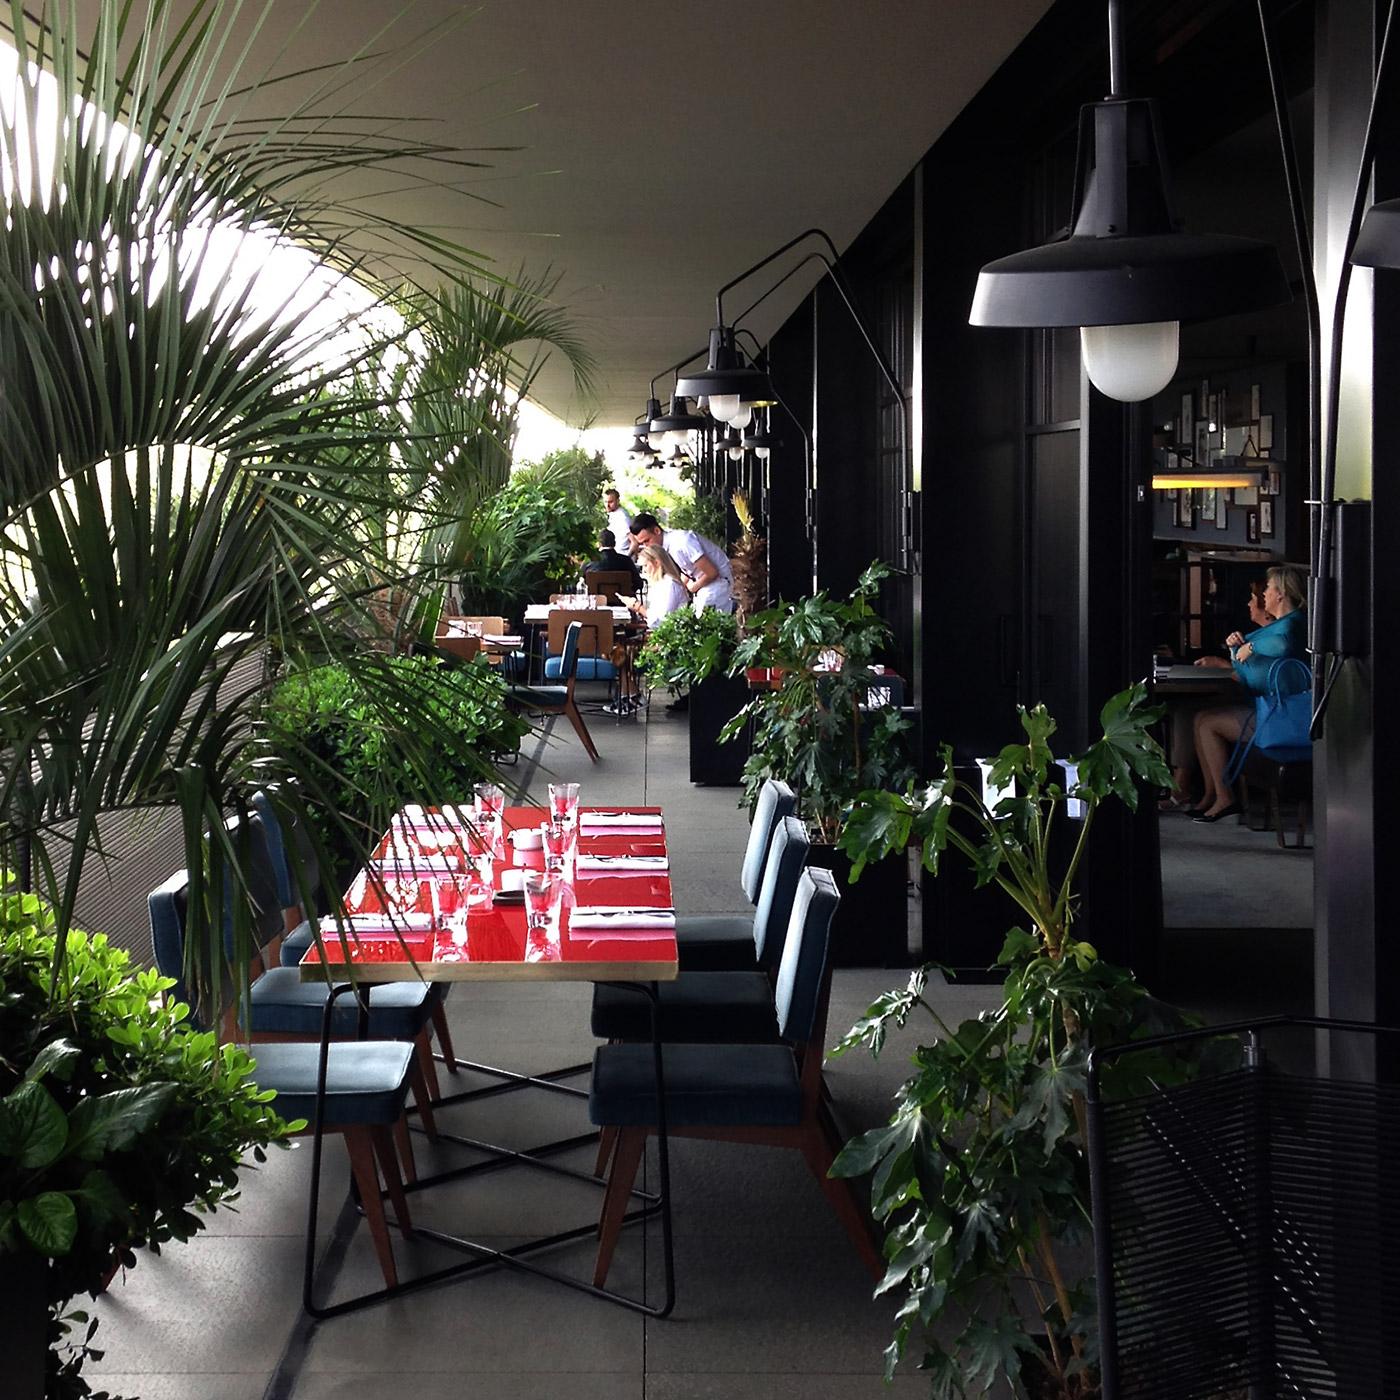 Ceresio 7 restaurant balcony in Milan